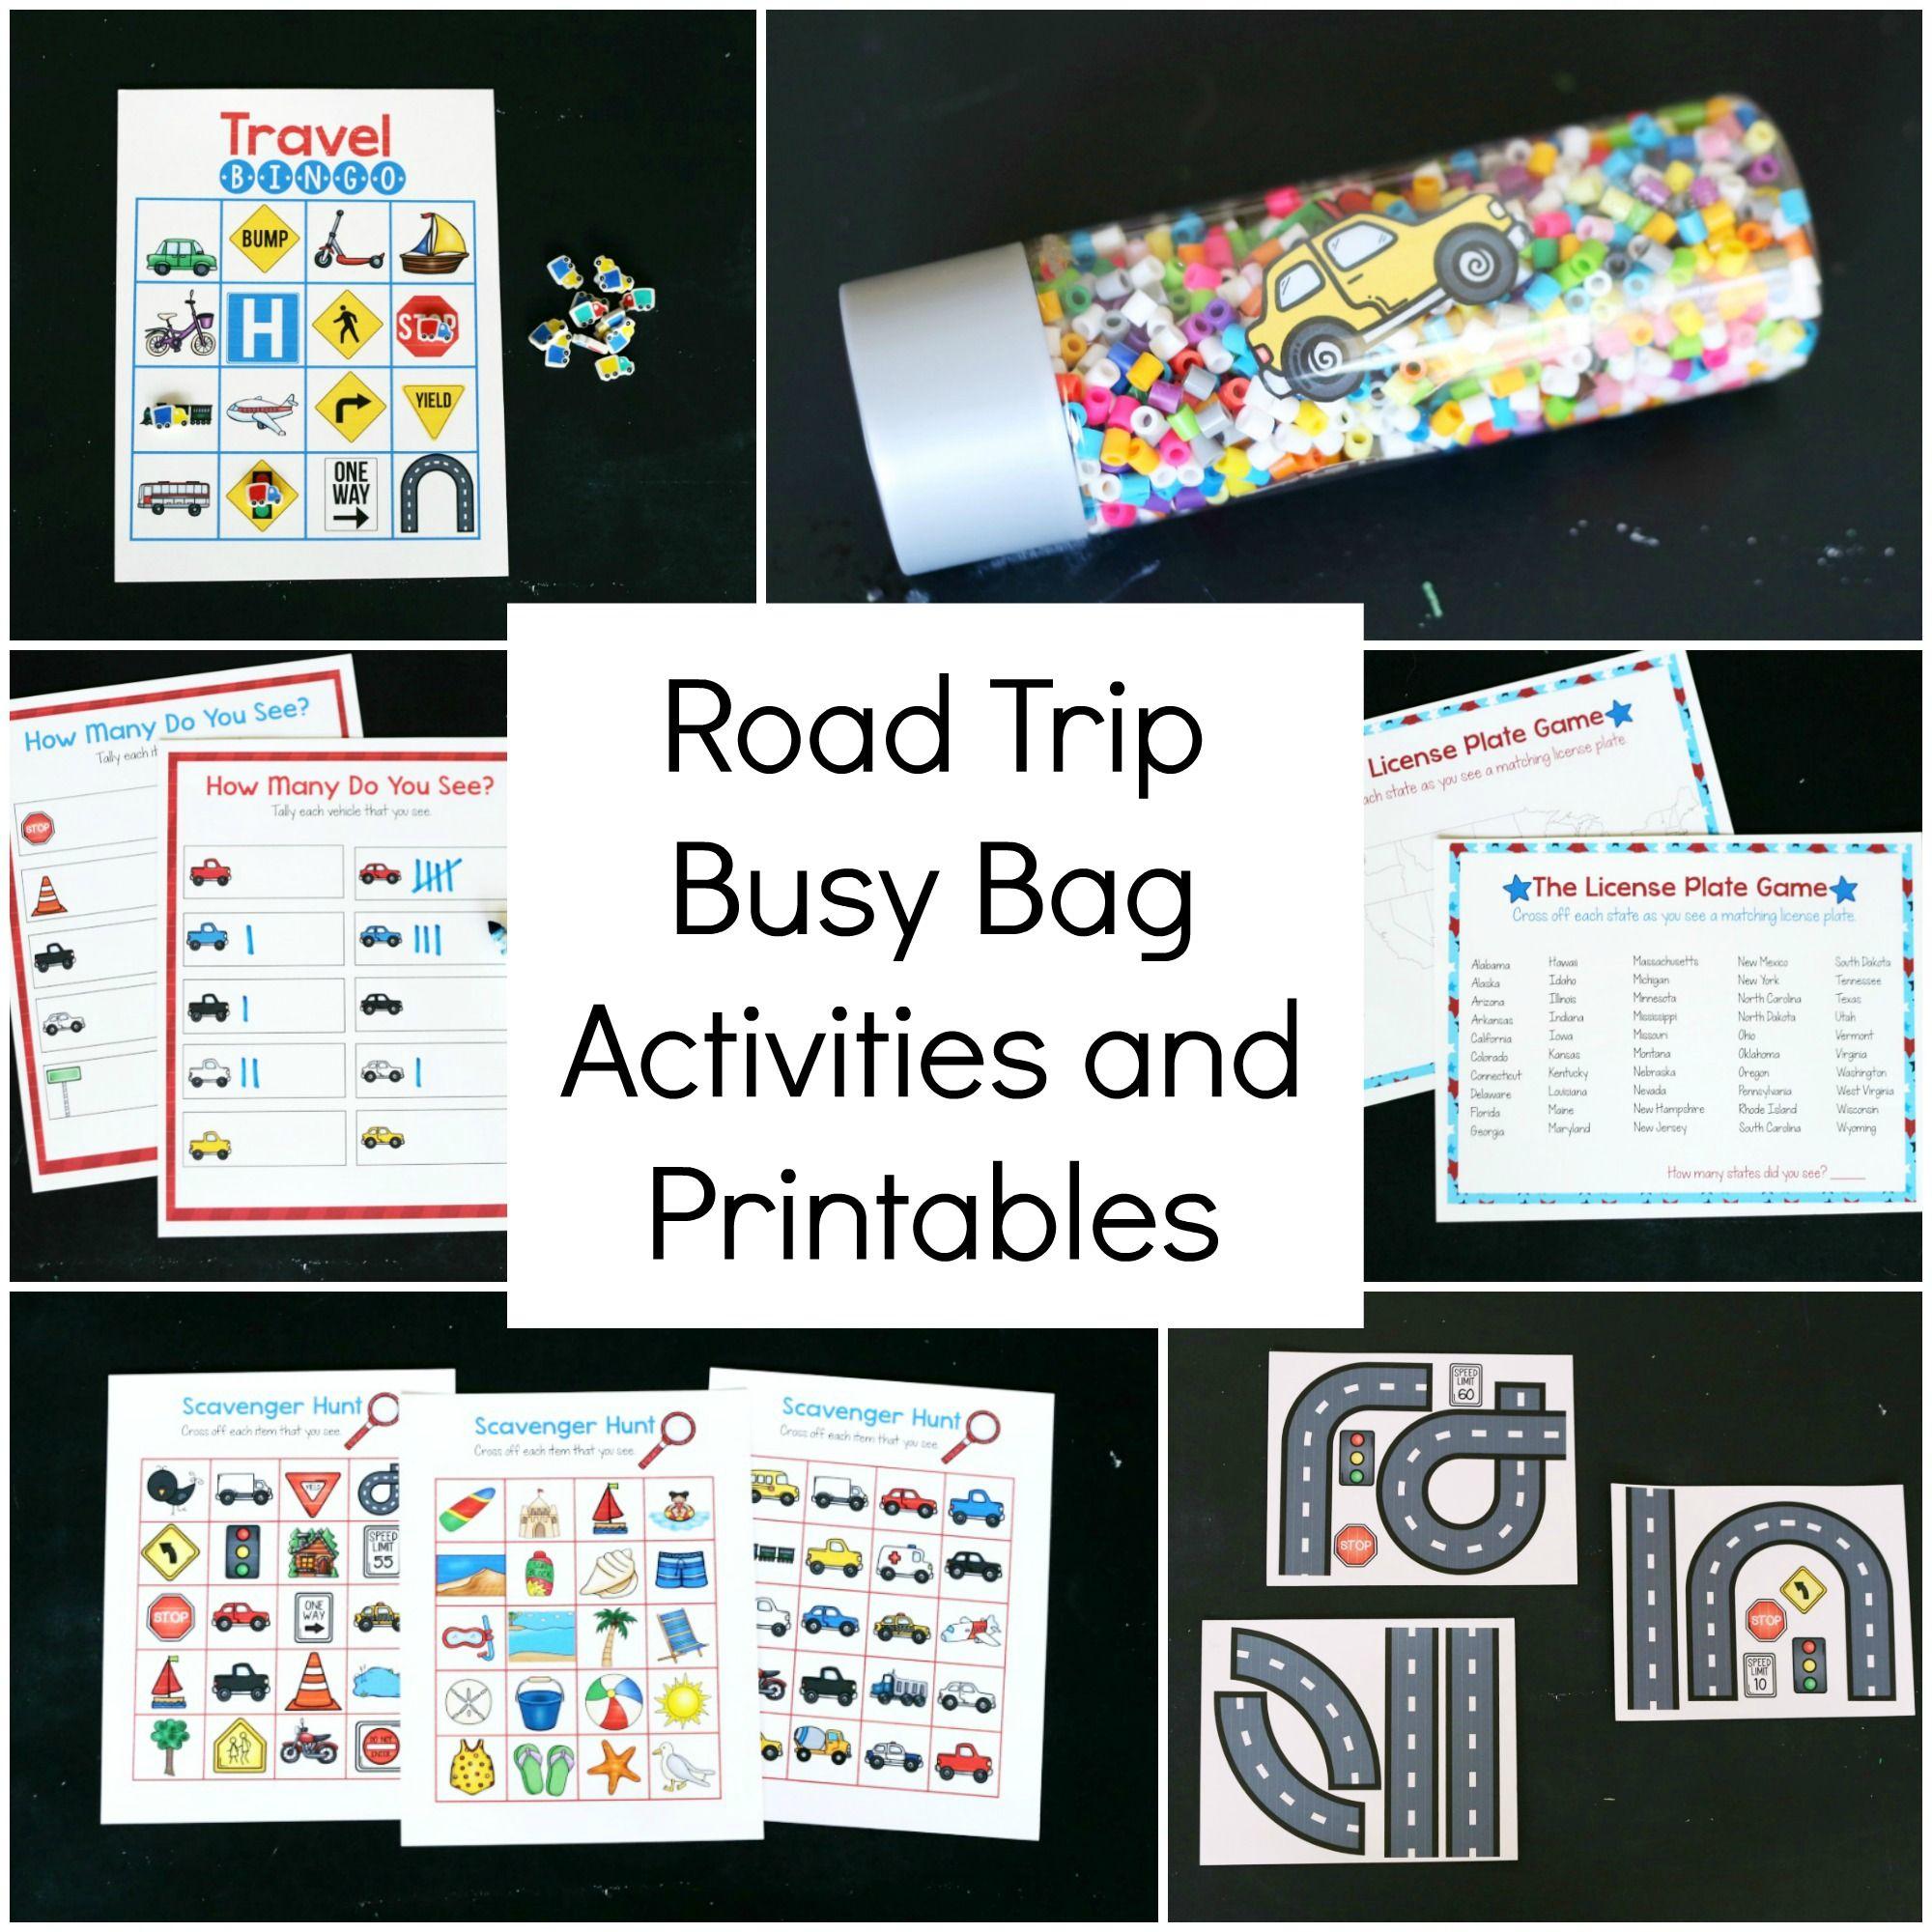 Printable Road Trip Busy Bag Activities